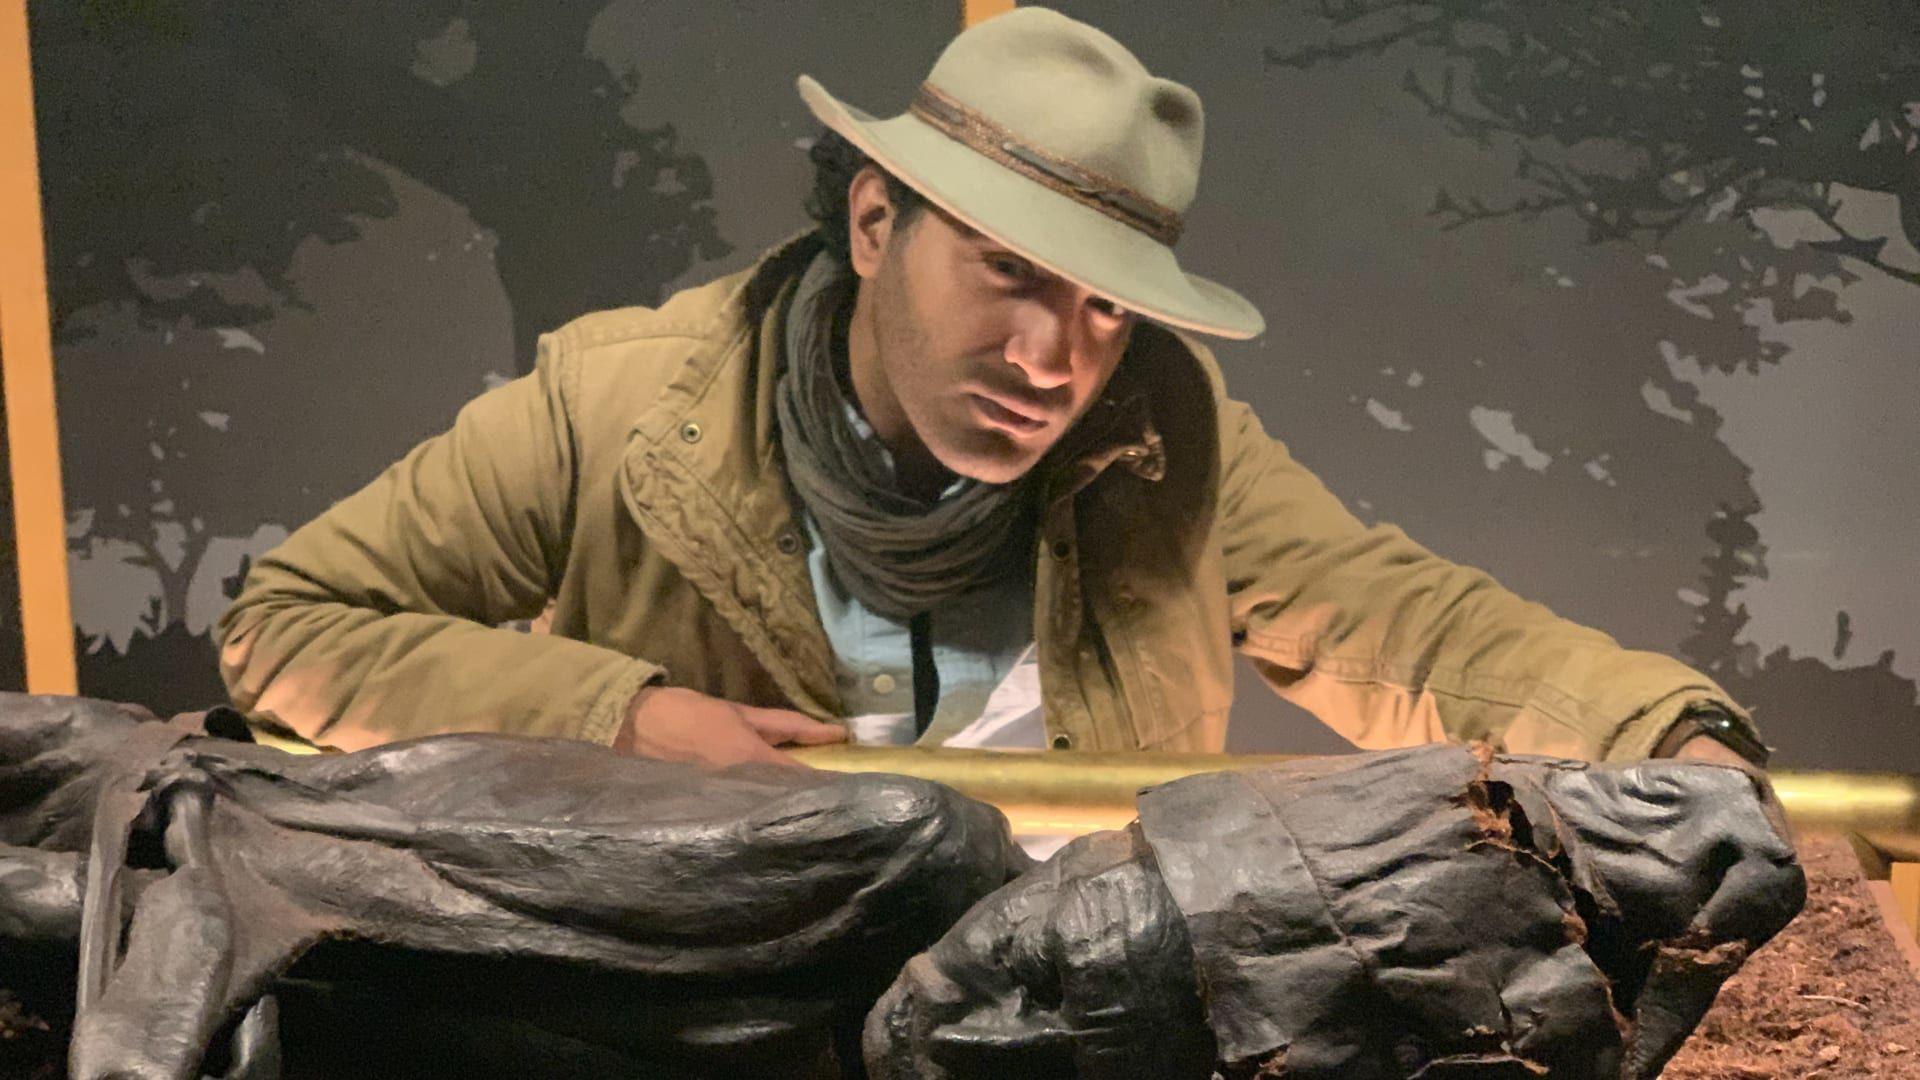 Mummies Unwrapped — s01e06 — The Trail of Murdered Mummies